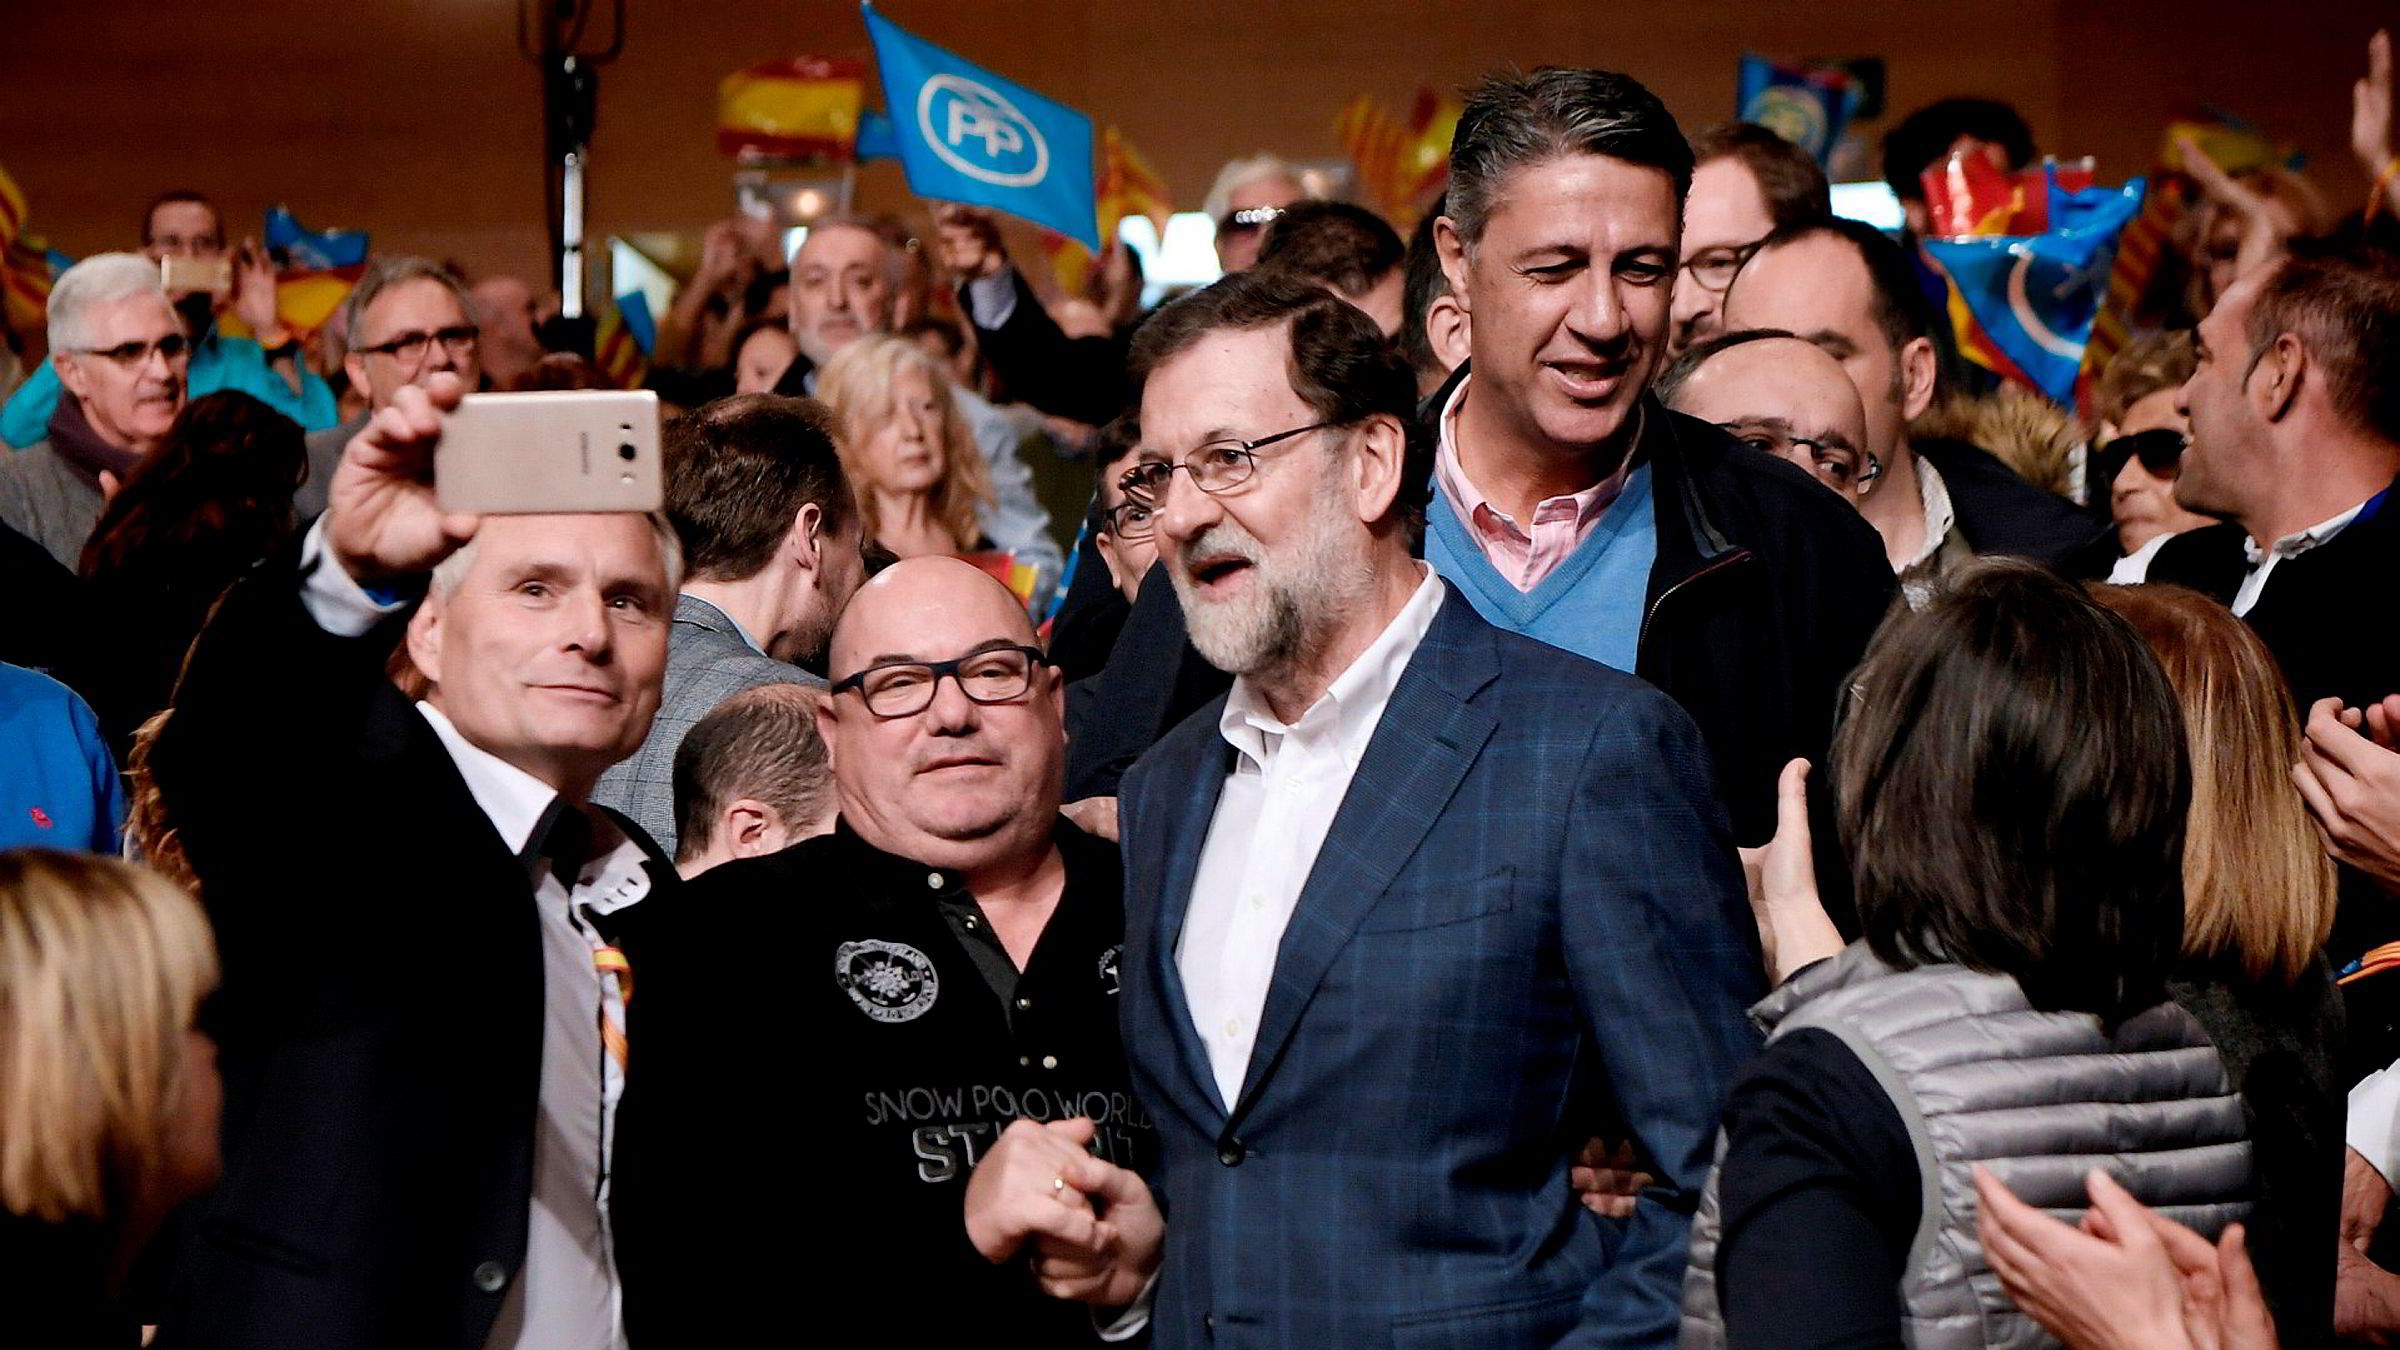 Lederen for det katalanske Folkepartiet (Partido Popular), Xavier Garcia Albiol (bak), ankommer et valgkamparrangement sammen med Spanias statsminister Mariano Rajoy (foran i midten). Torsdag avholdes regionalvalg i Catalonia.